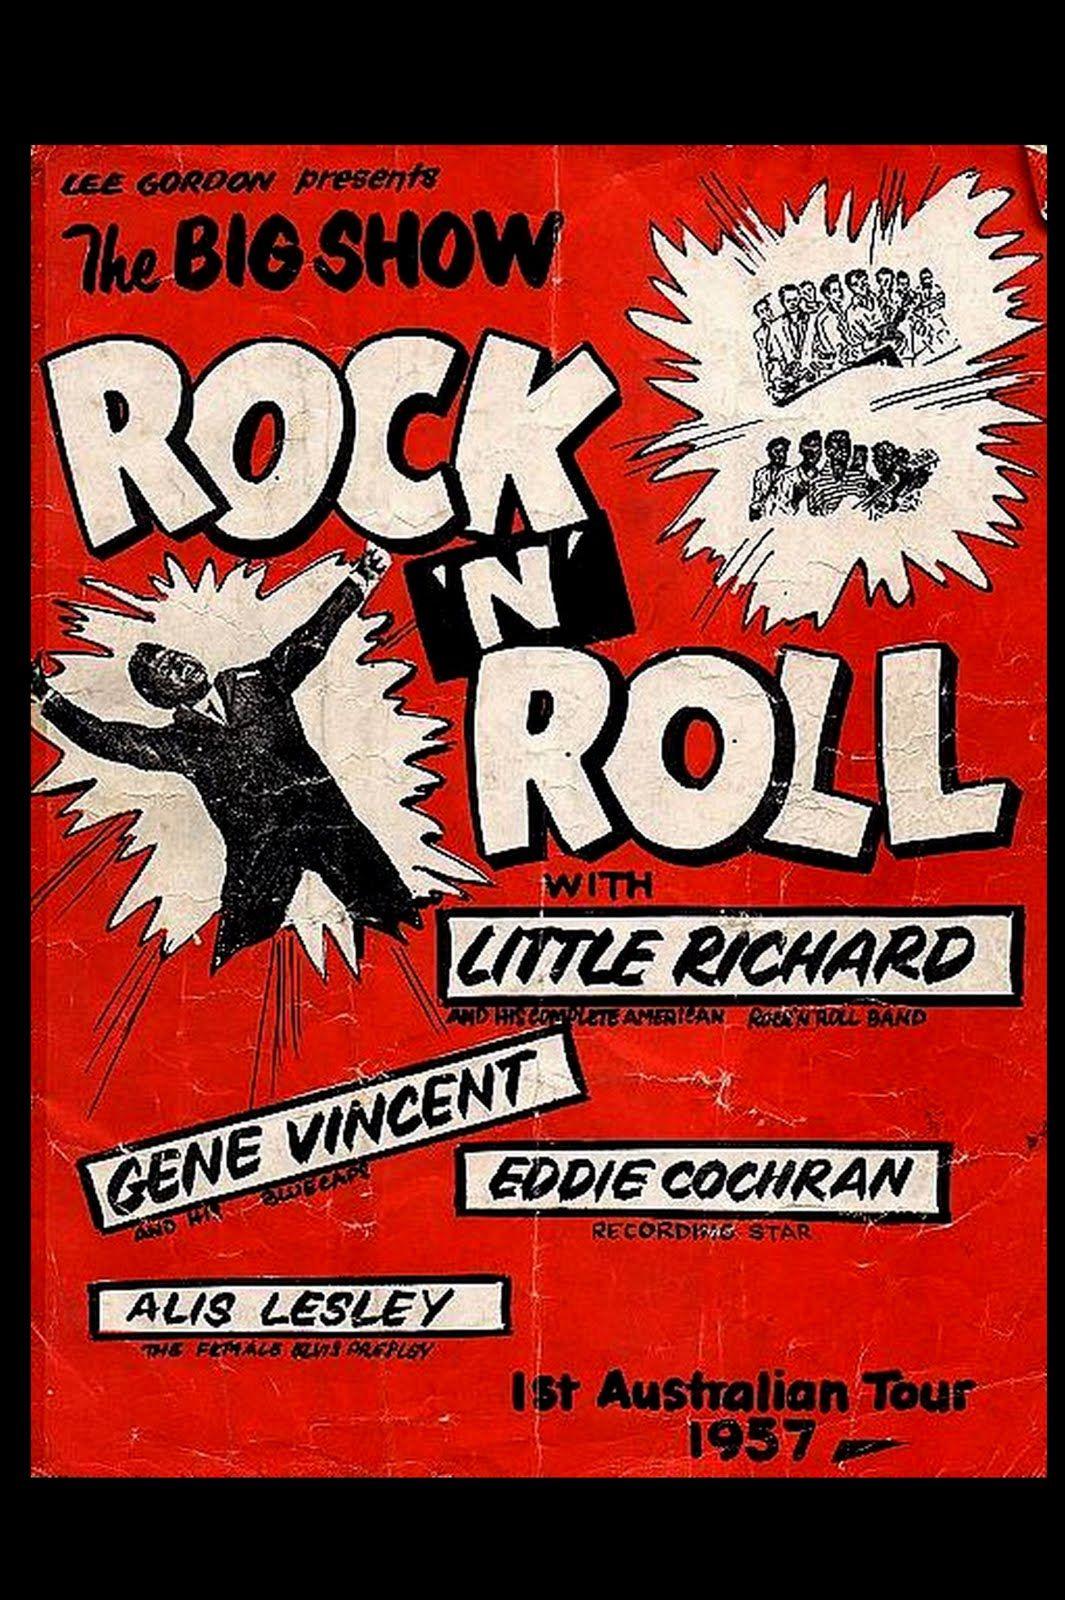 Rock n roll poster design - Vintage Rock Posters Stadium First Rock N Roll